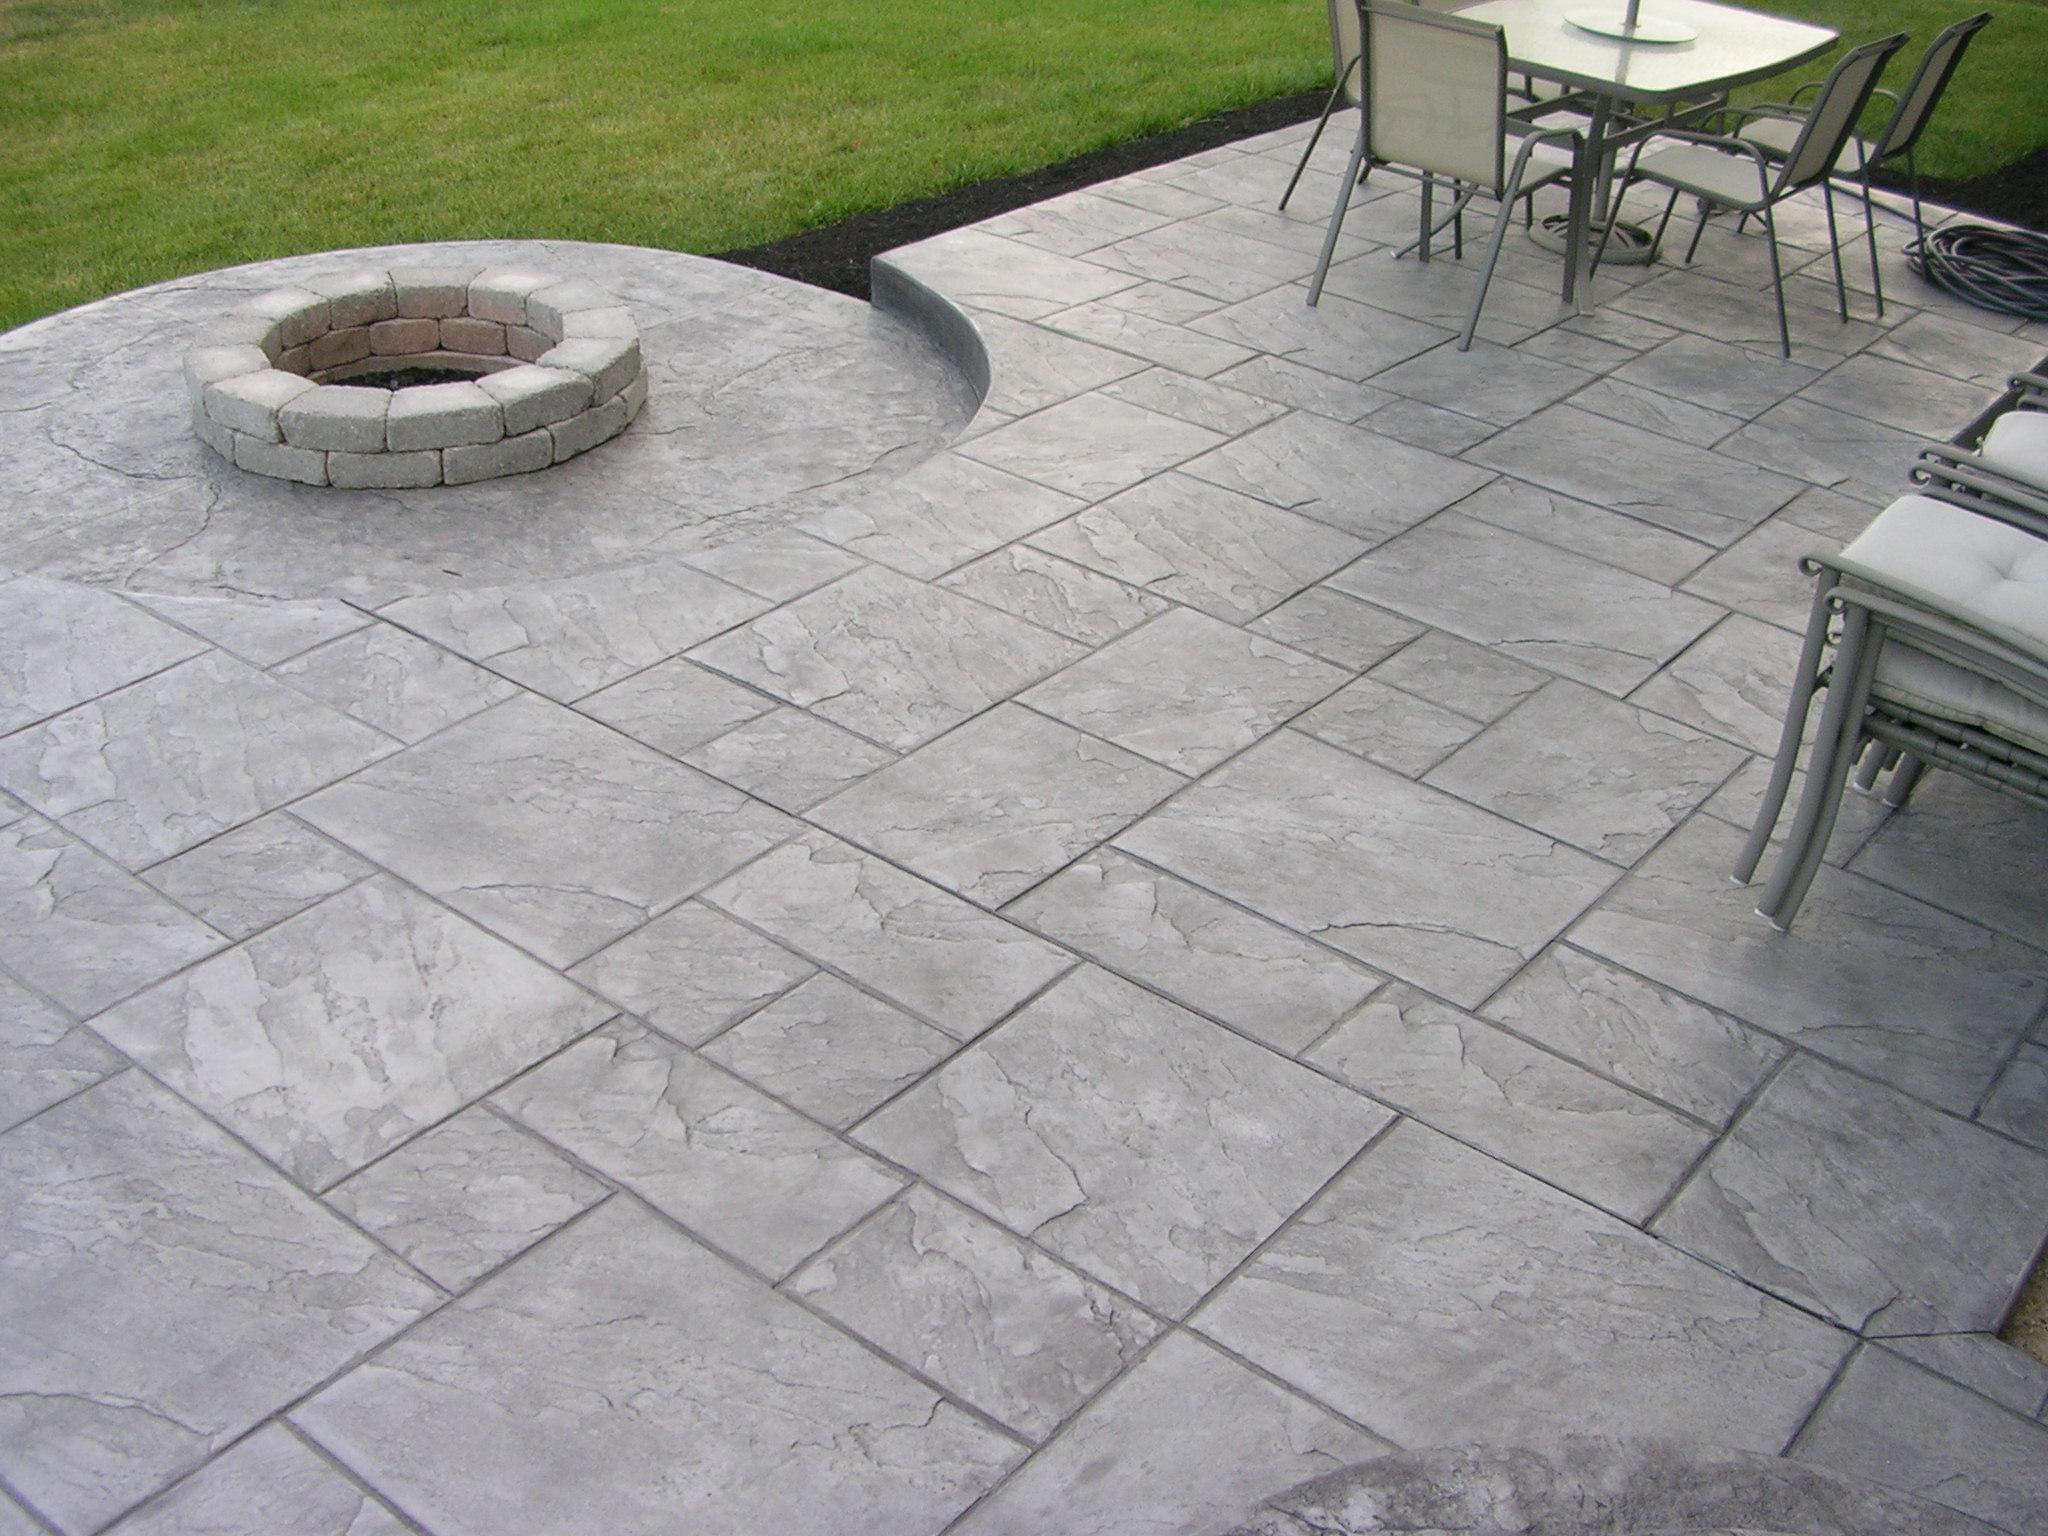 Flooring New Hampshire Epoxy Garage Stamped Concrete on Pavestone Patio Ideas id=62421